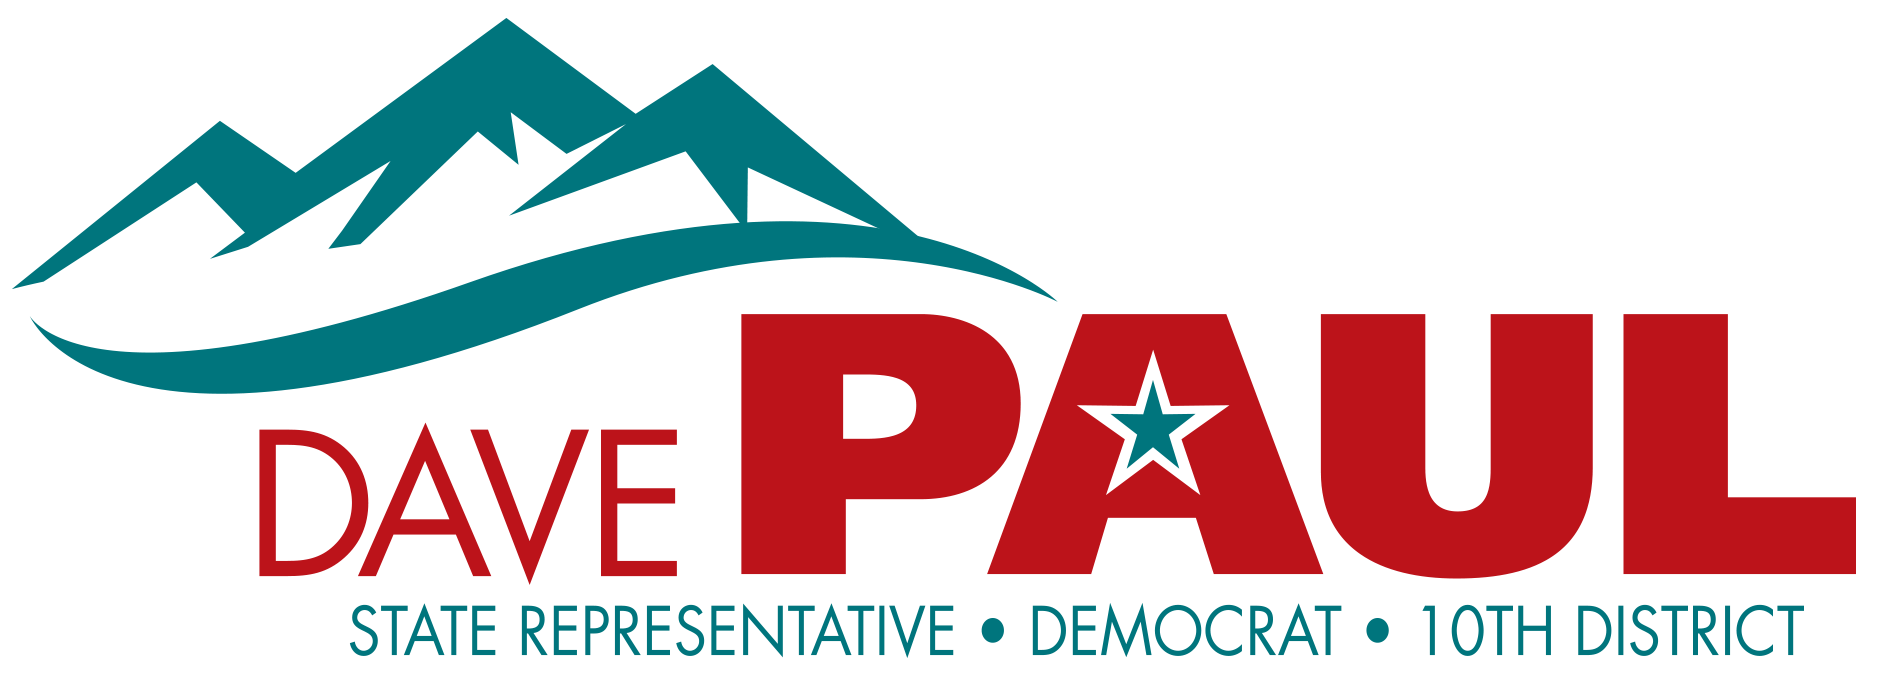 Vote Dave Paul